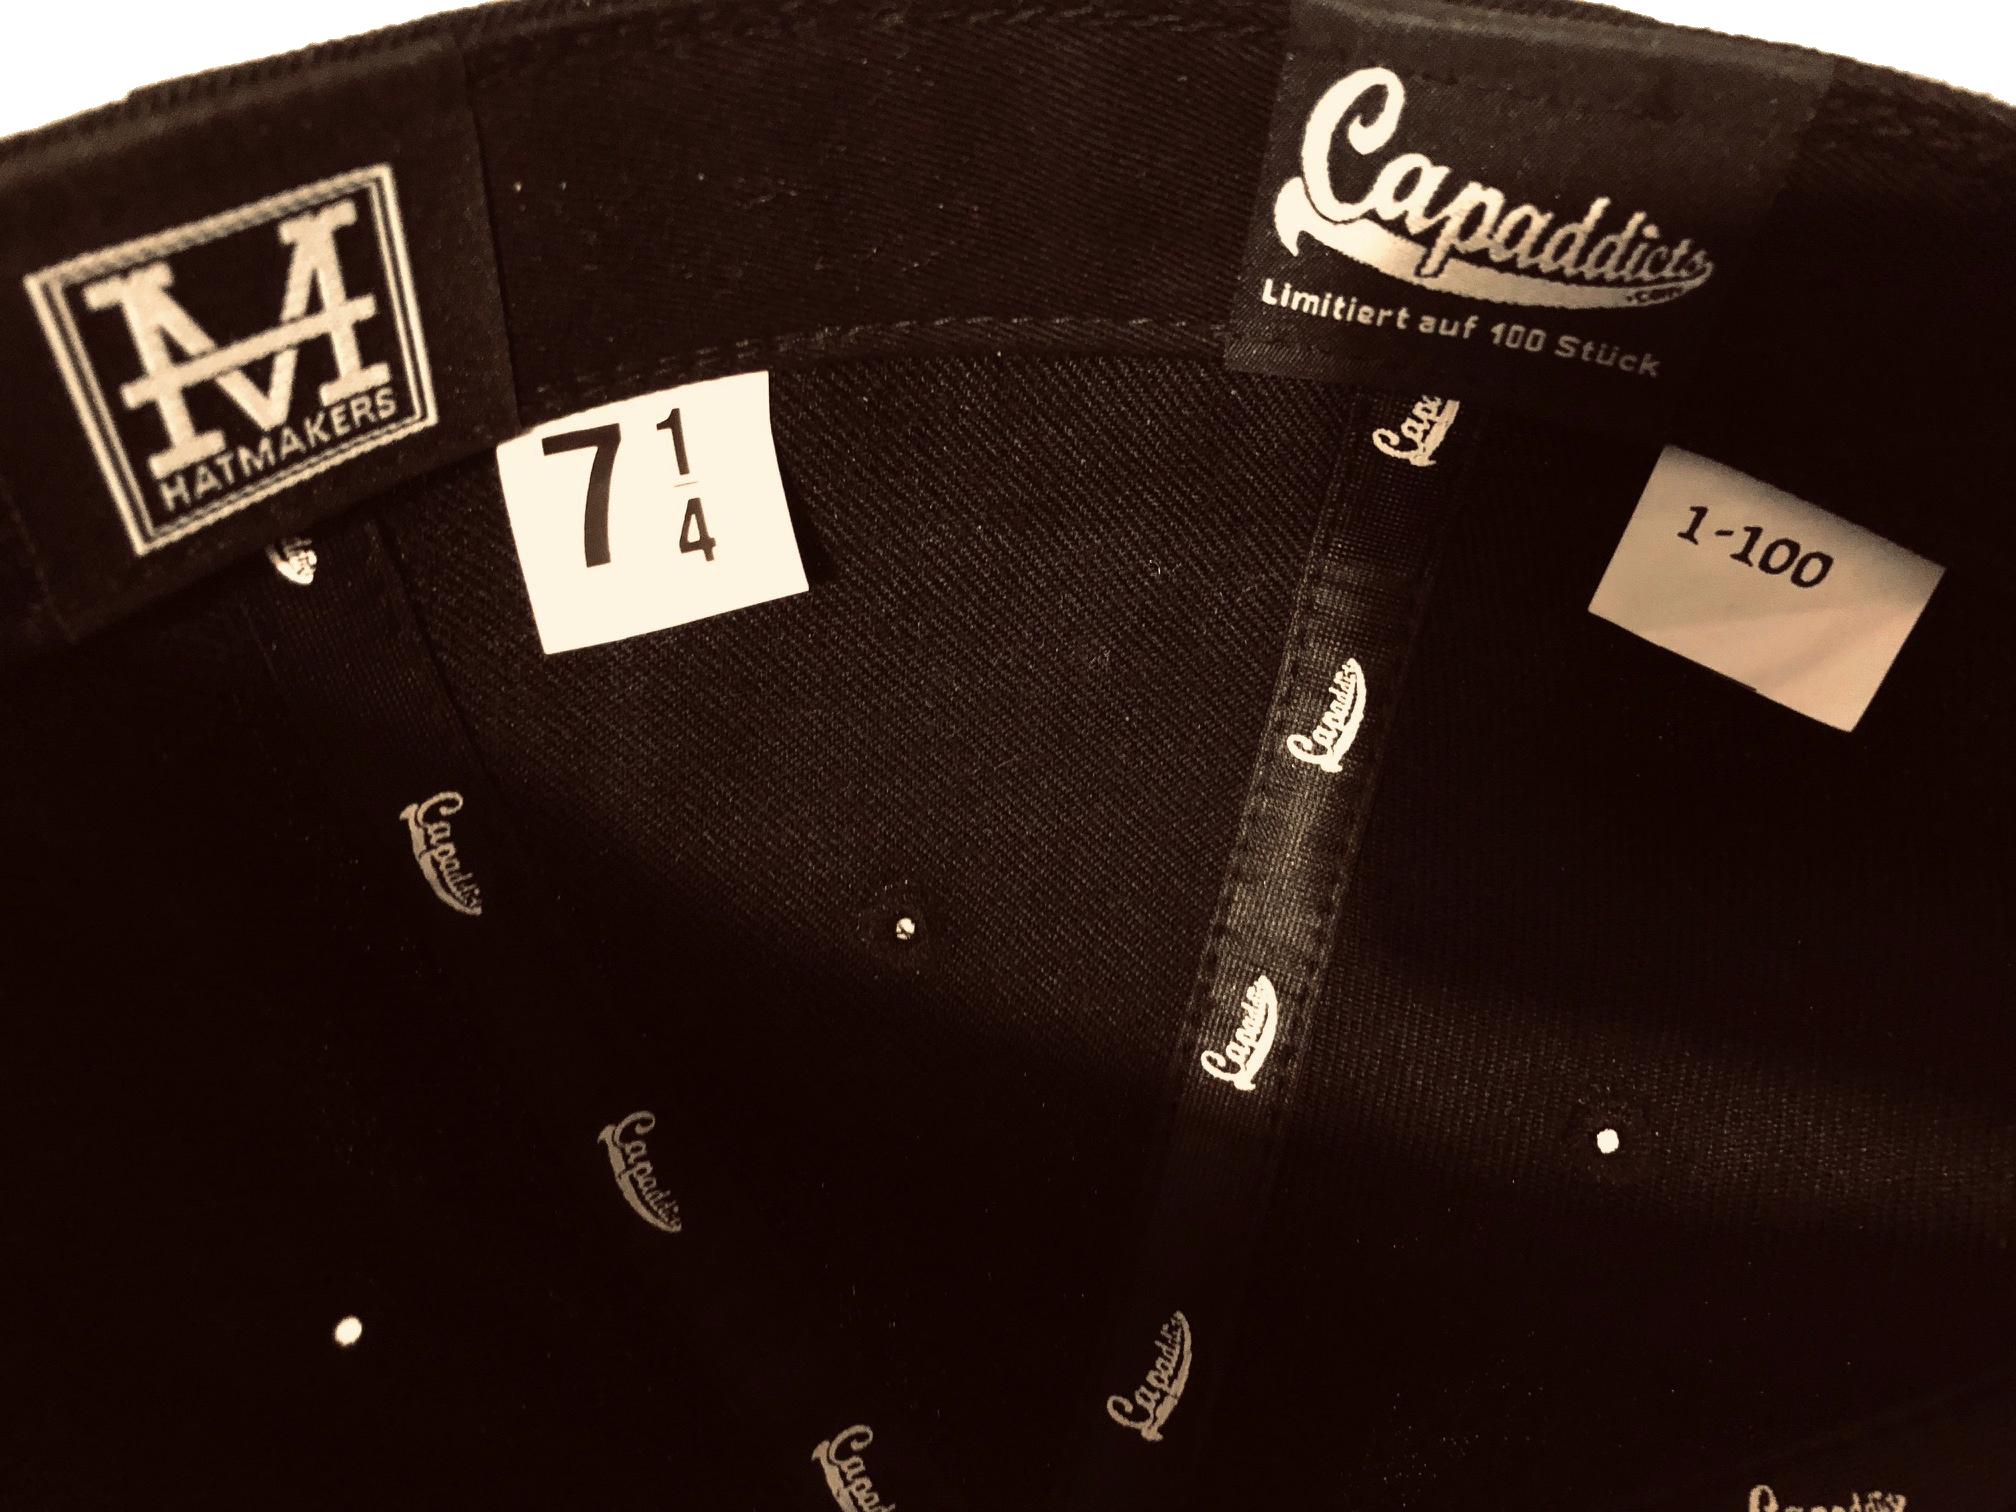 capaddicts-cap-tags